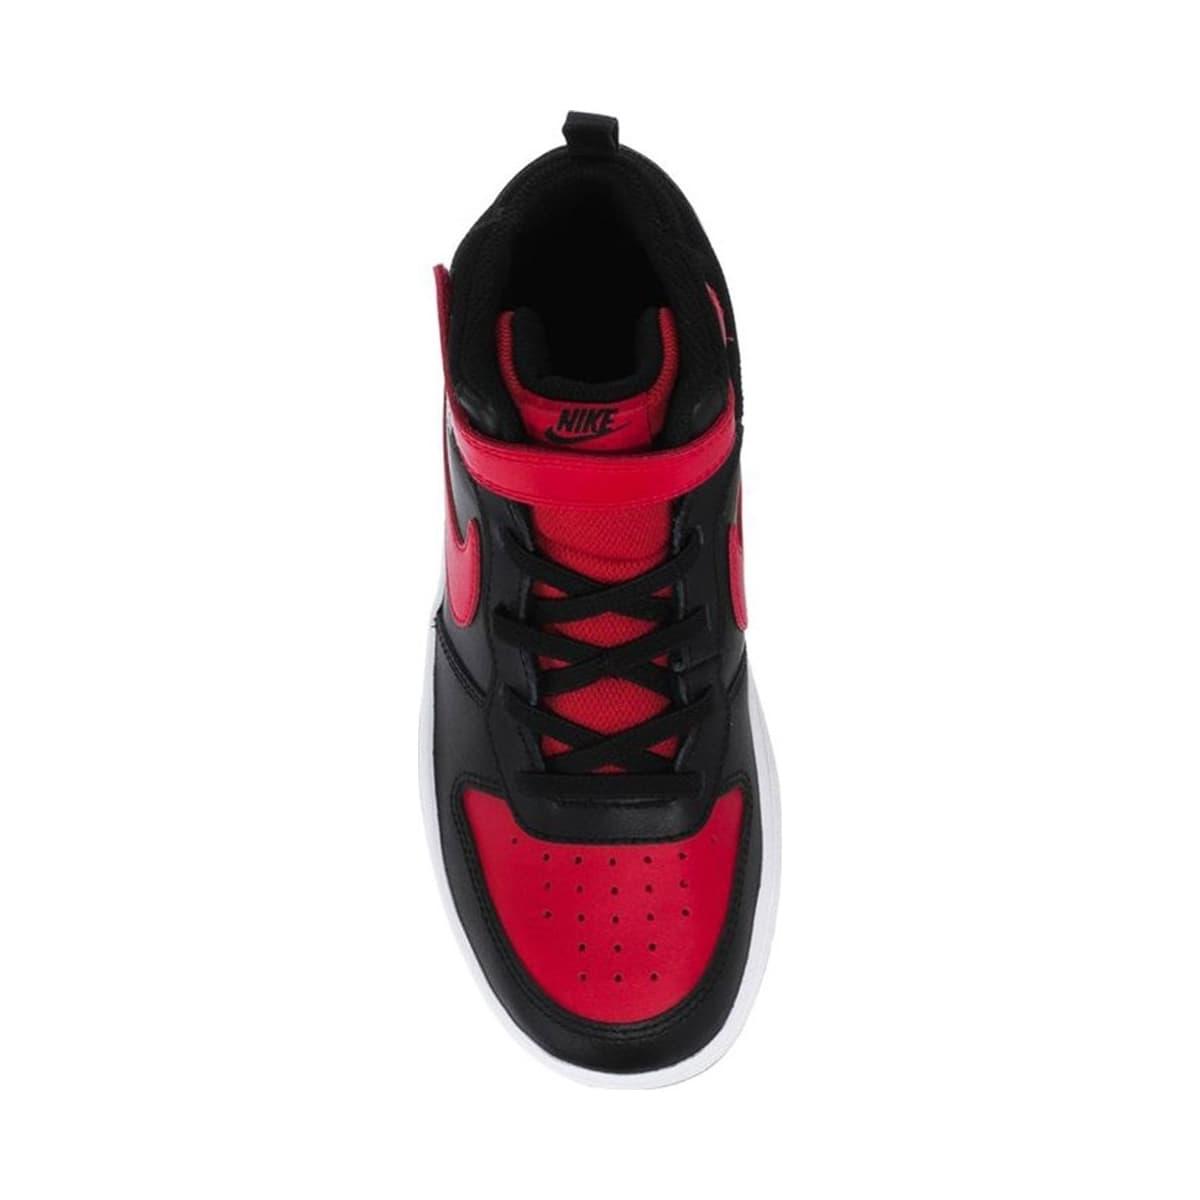 Court Borough Mid 2 Çocuk Siyah Basketbol Ayakkabısı (CD7783-003)